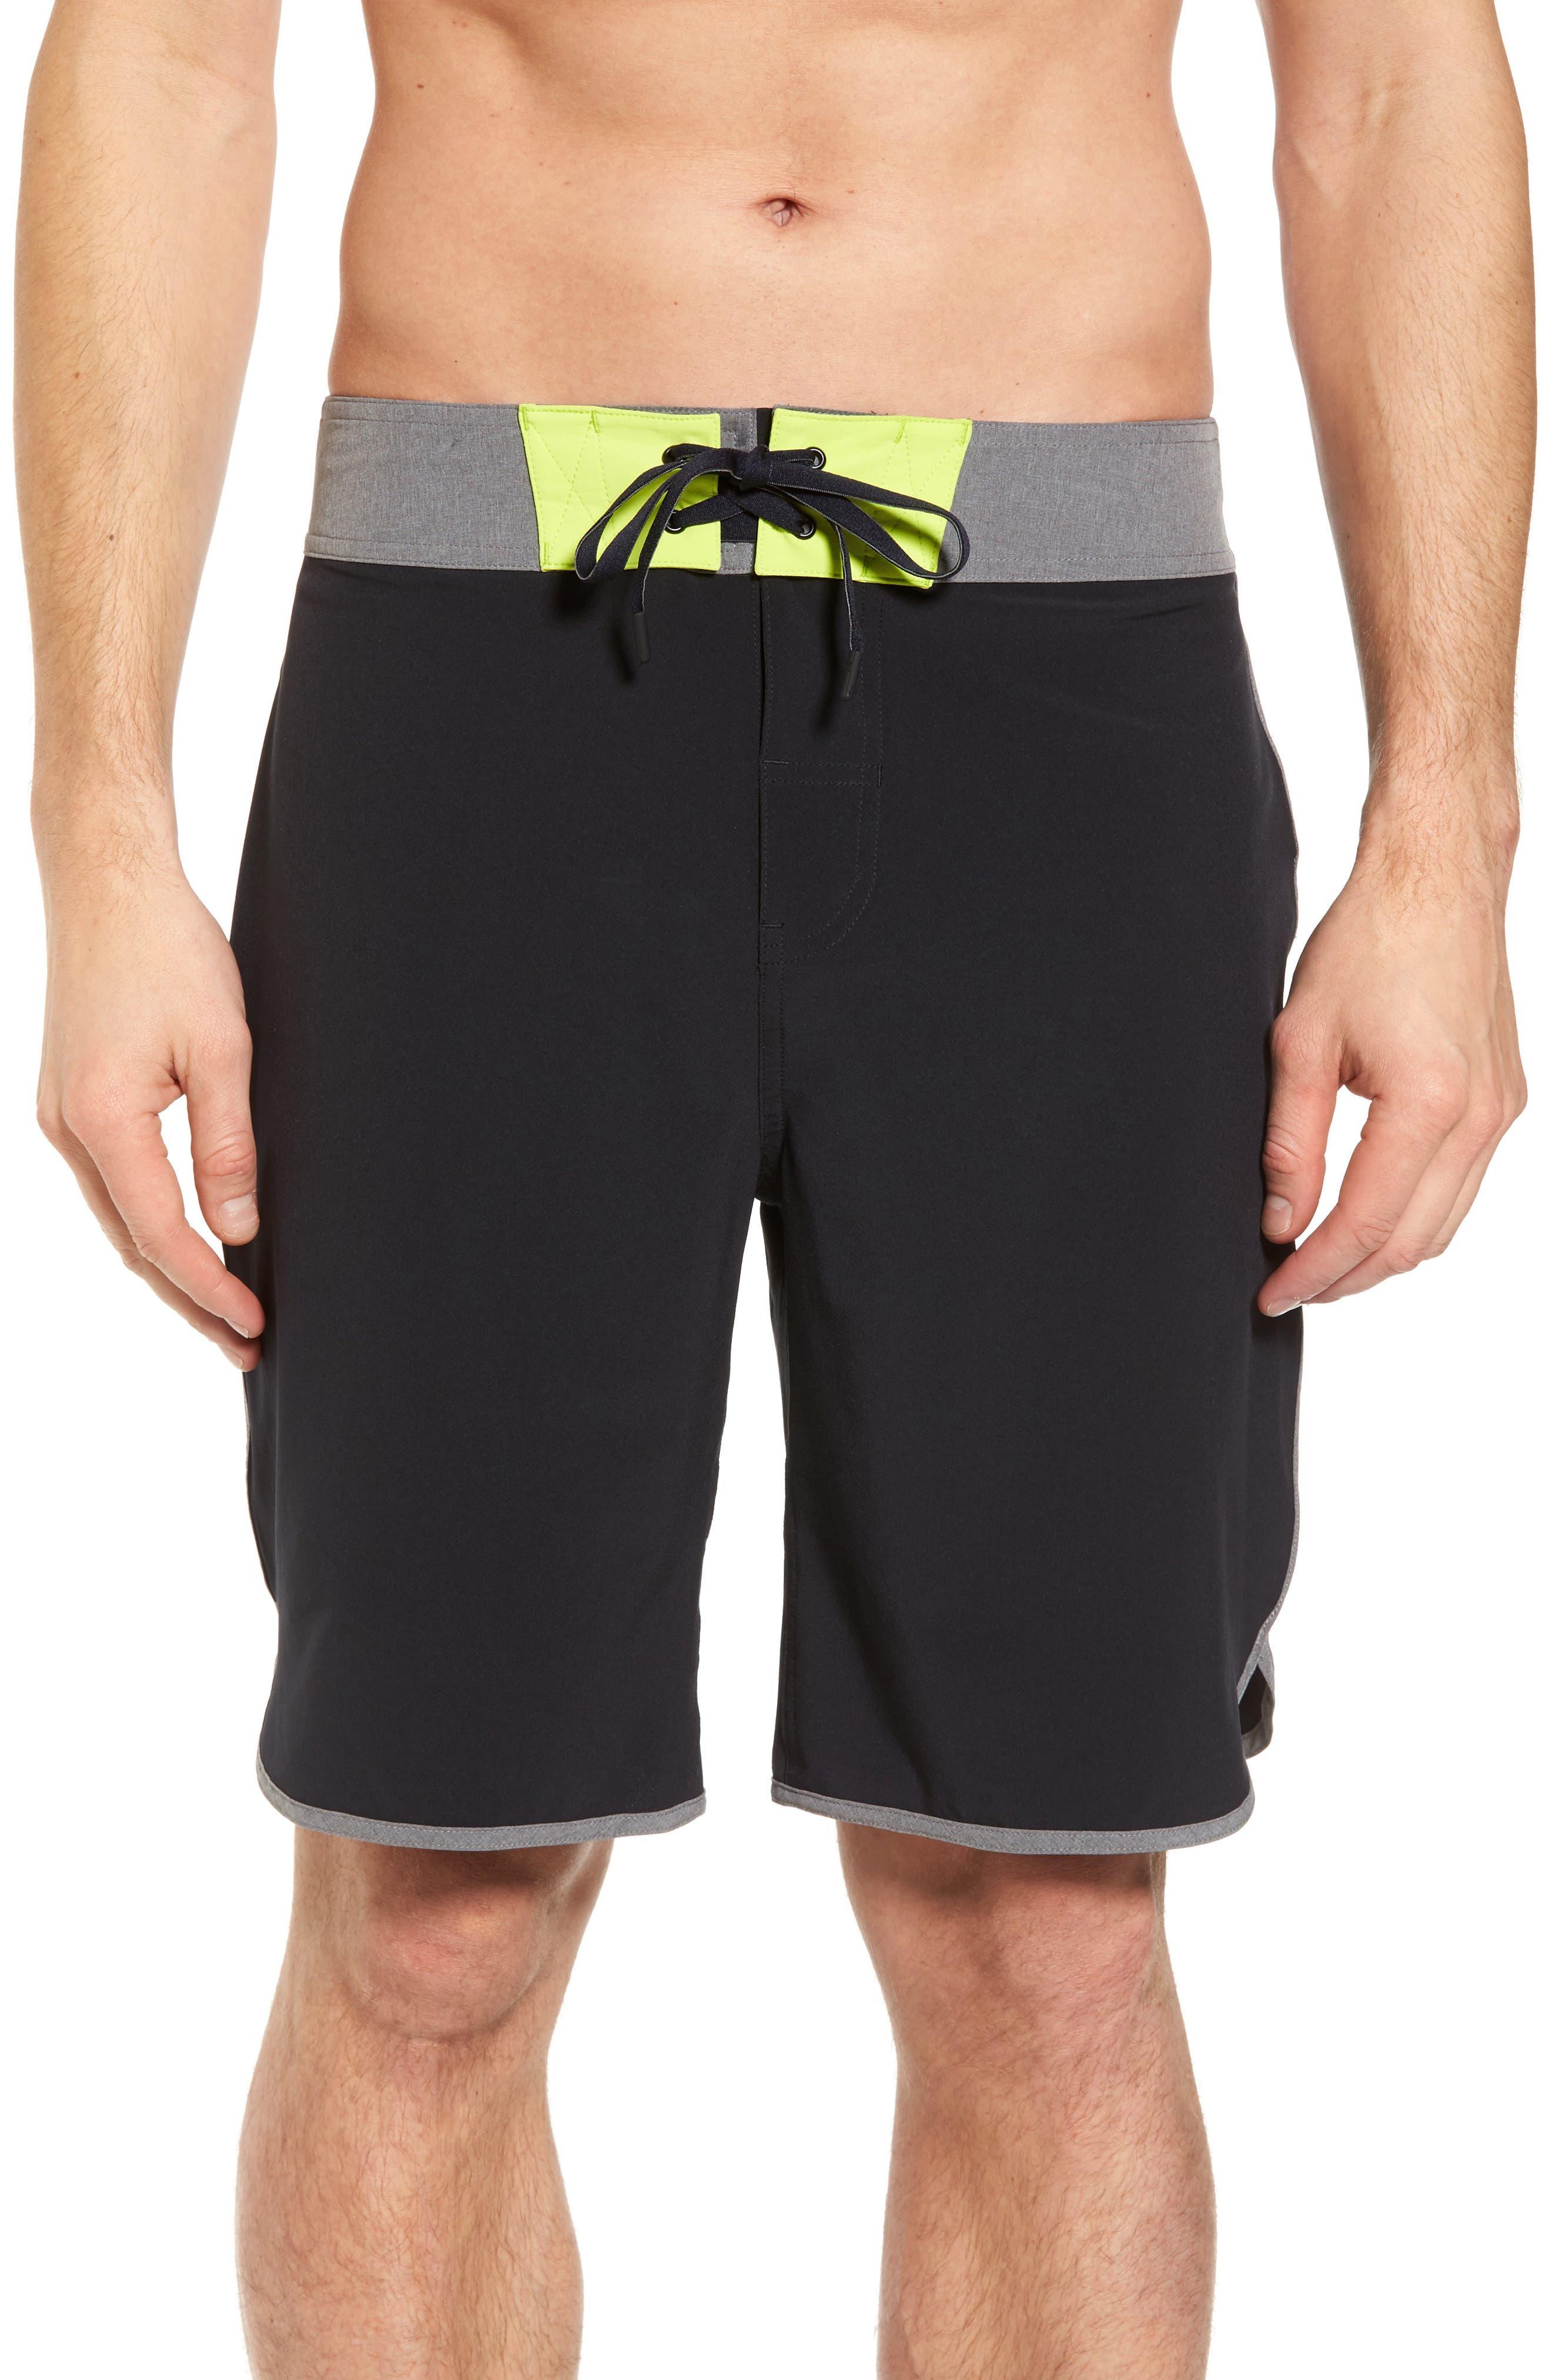 Flex Hybrid Athletic Shorts,                             Main thumbnail 1, color,                             Black